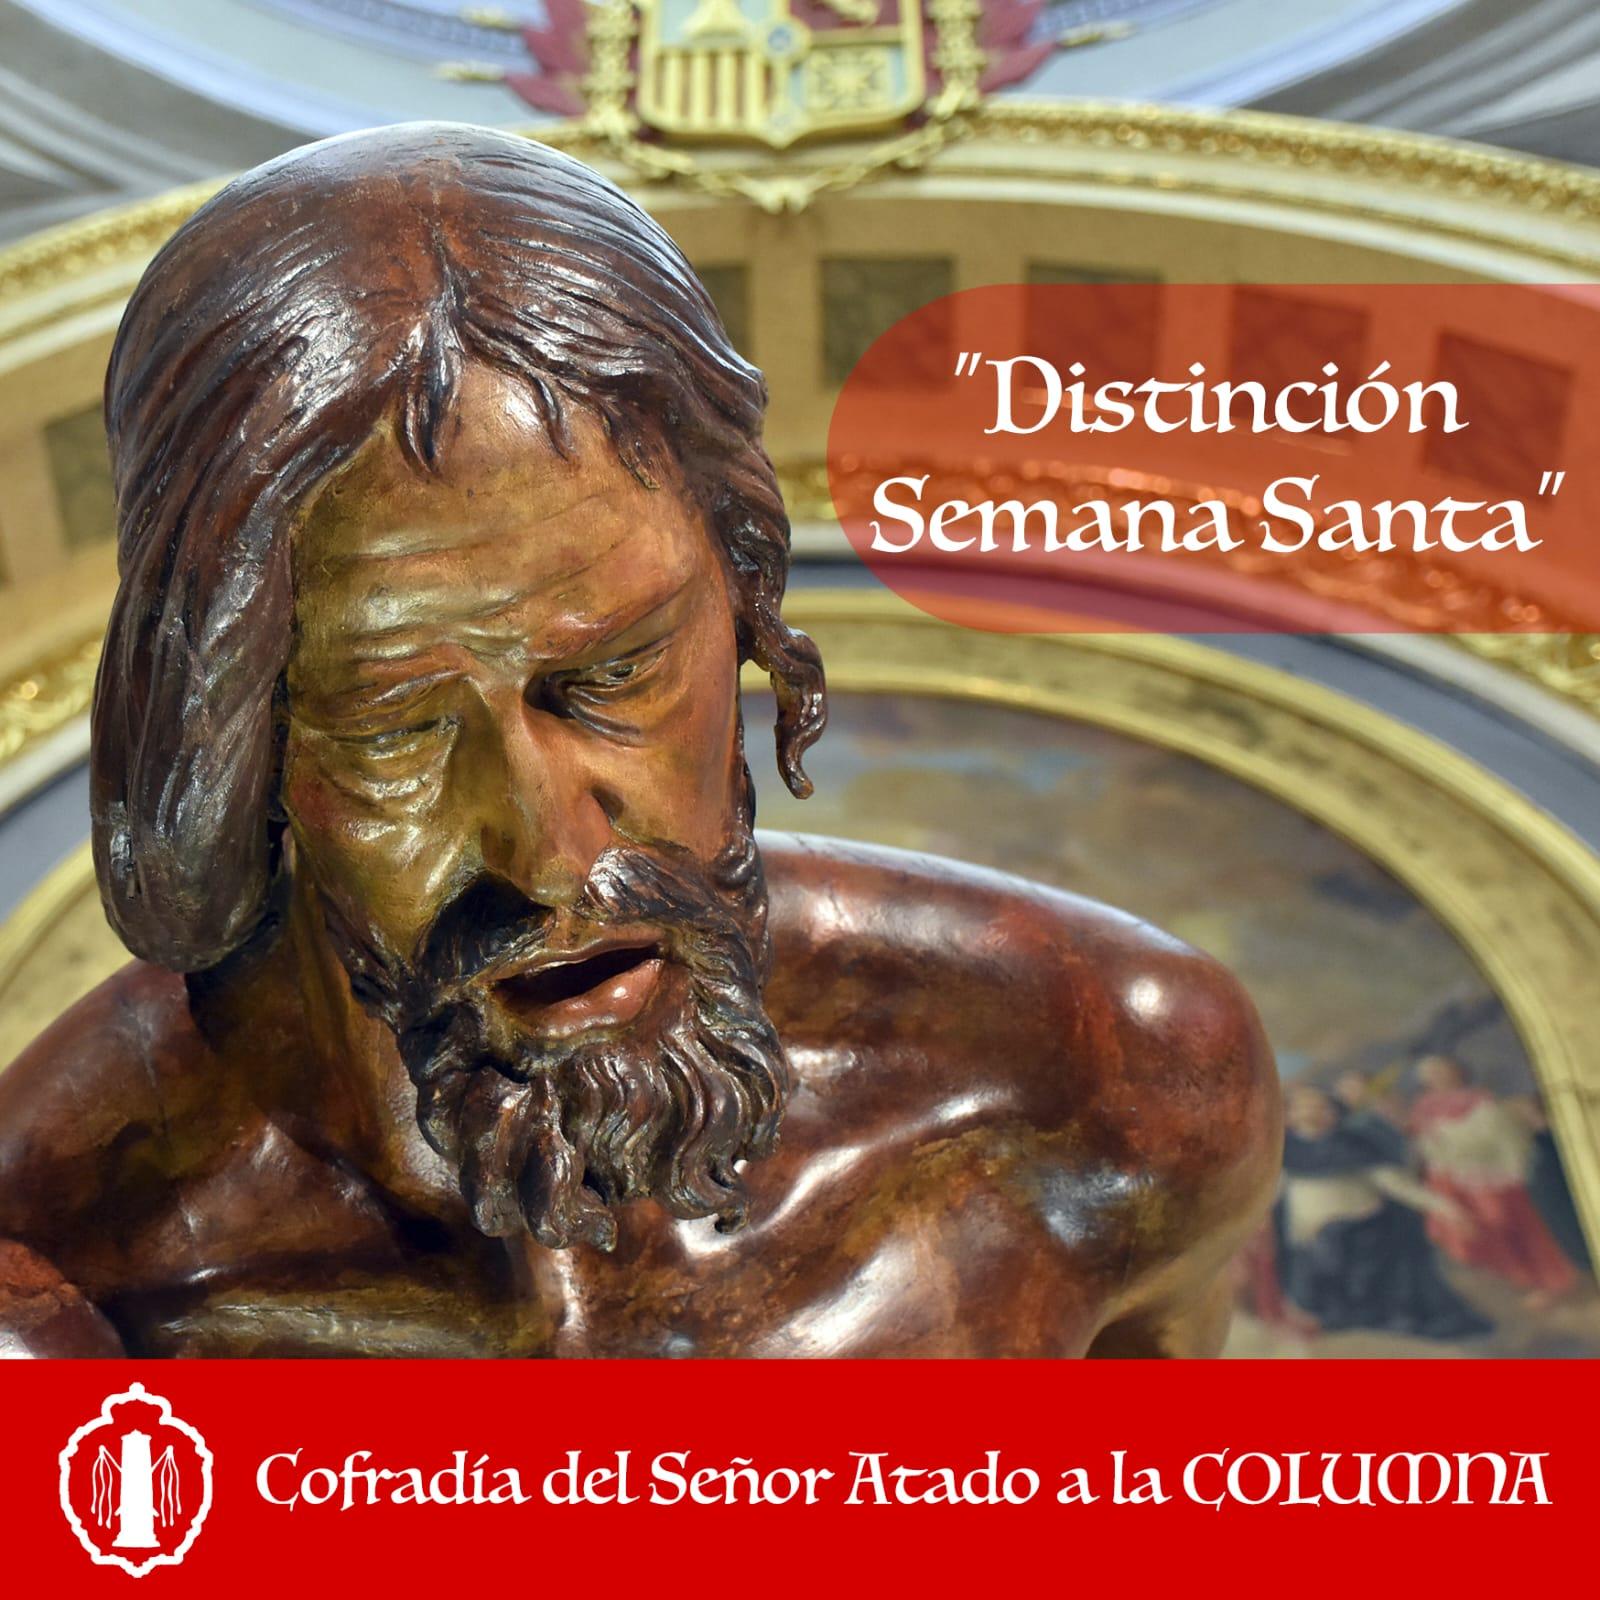 Distinción Semana Santa 2019